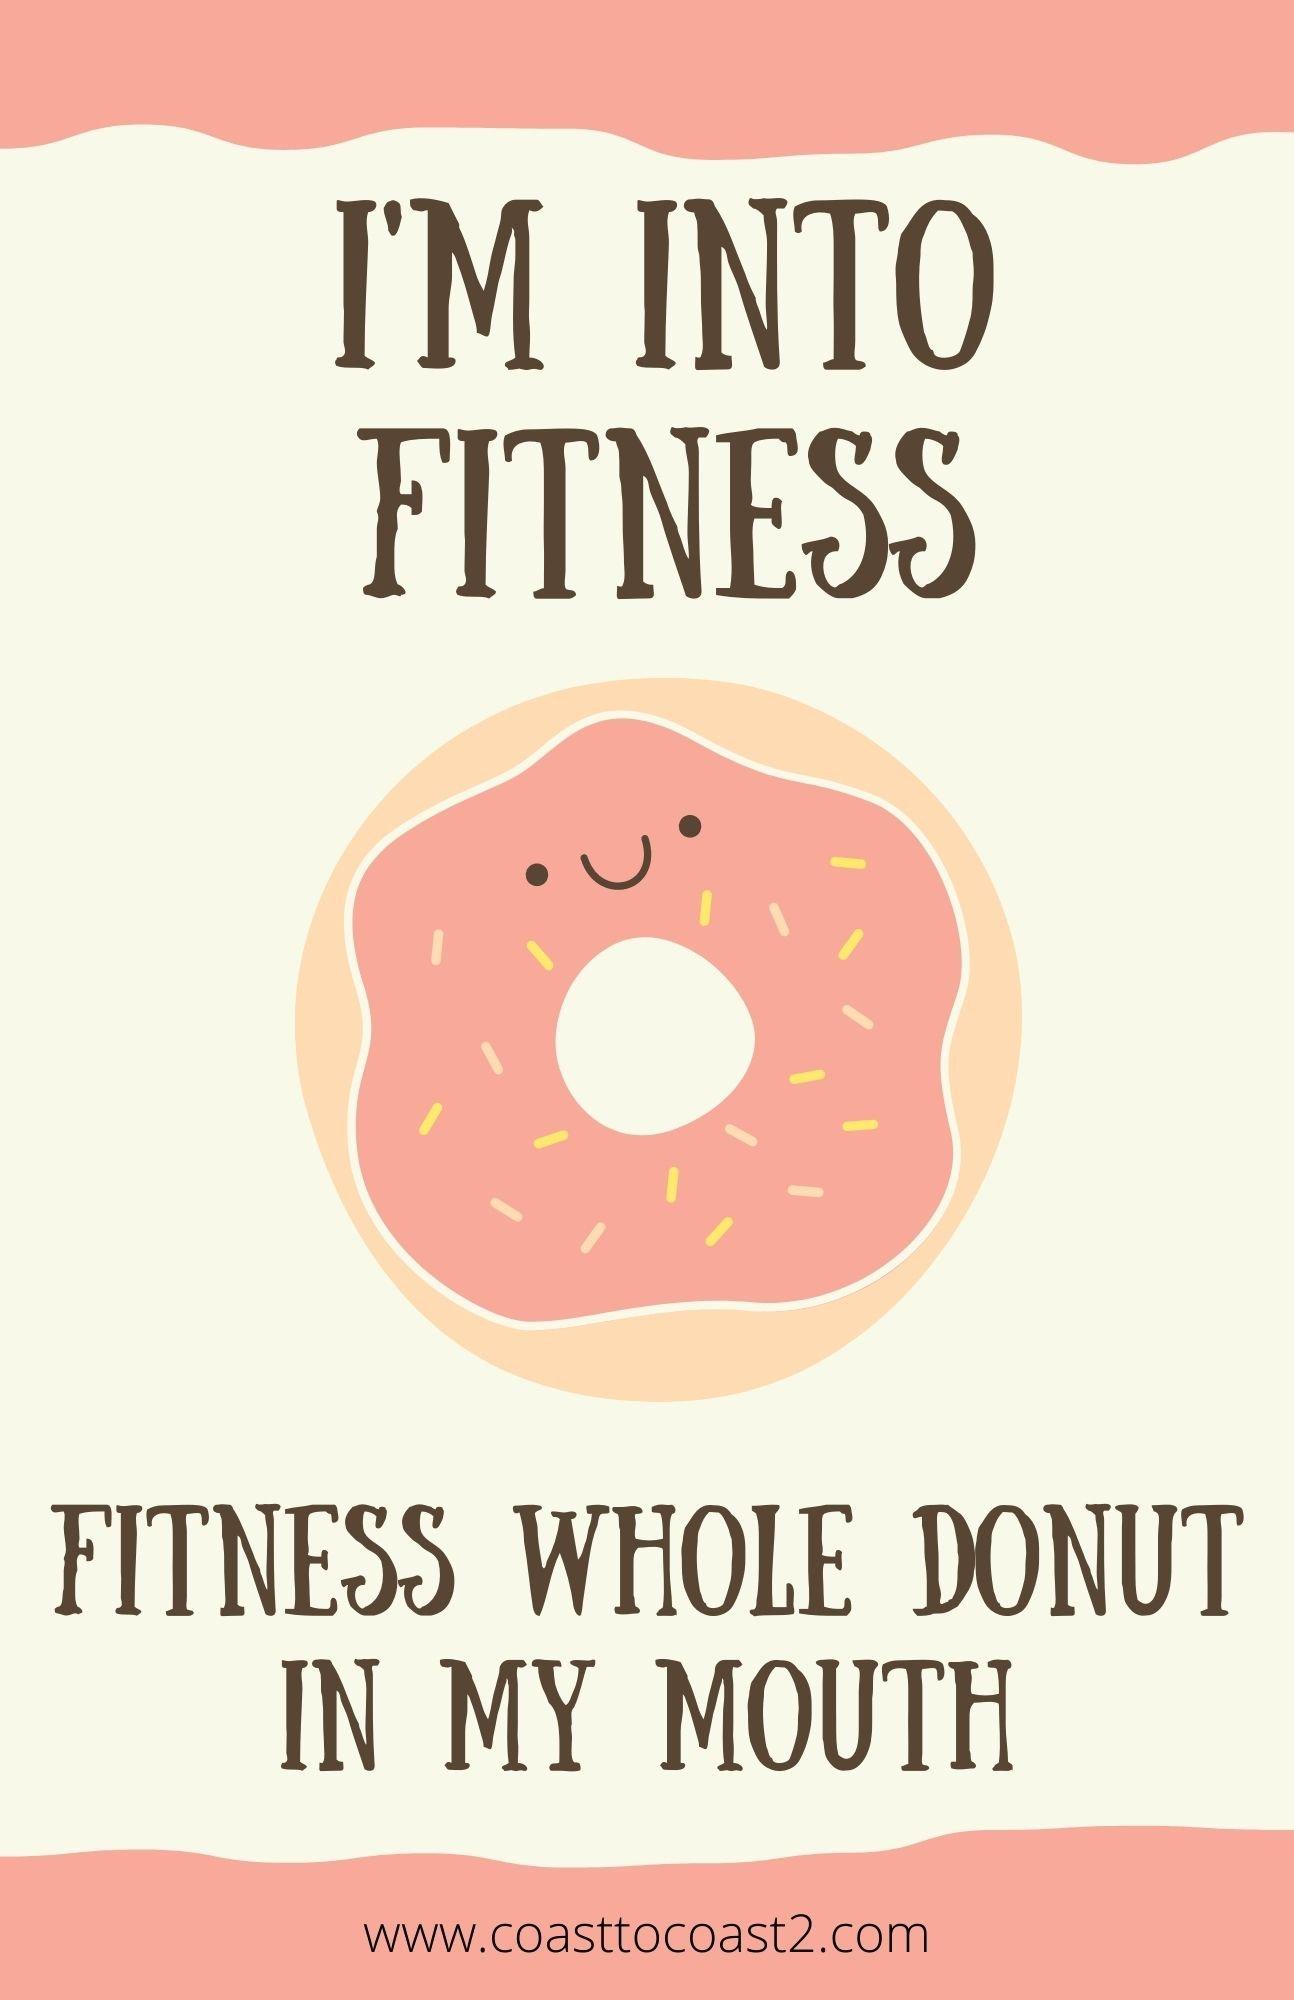 I'm into fitness